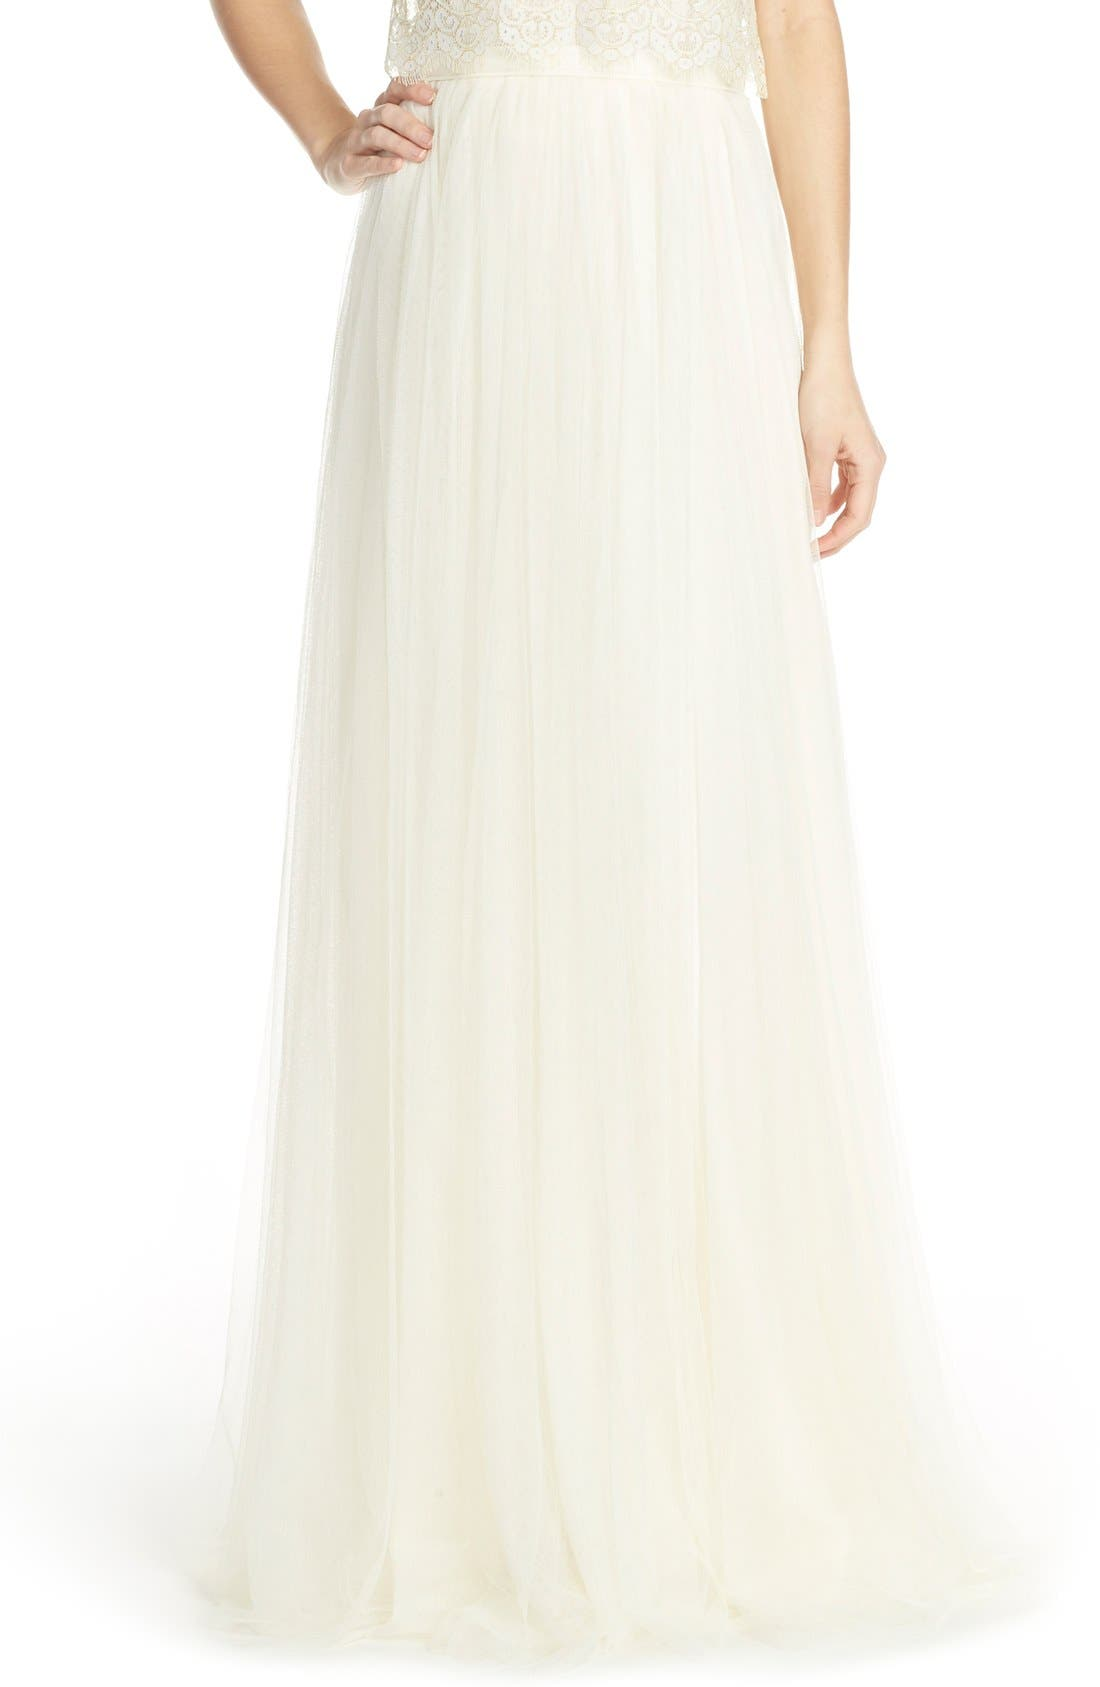 Main Image - Jenny Yoo 'Arabella' Tulle Ballgown Skirt